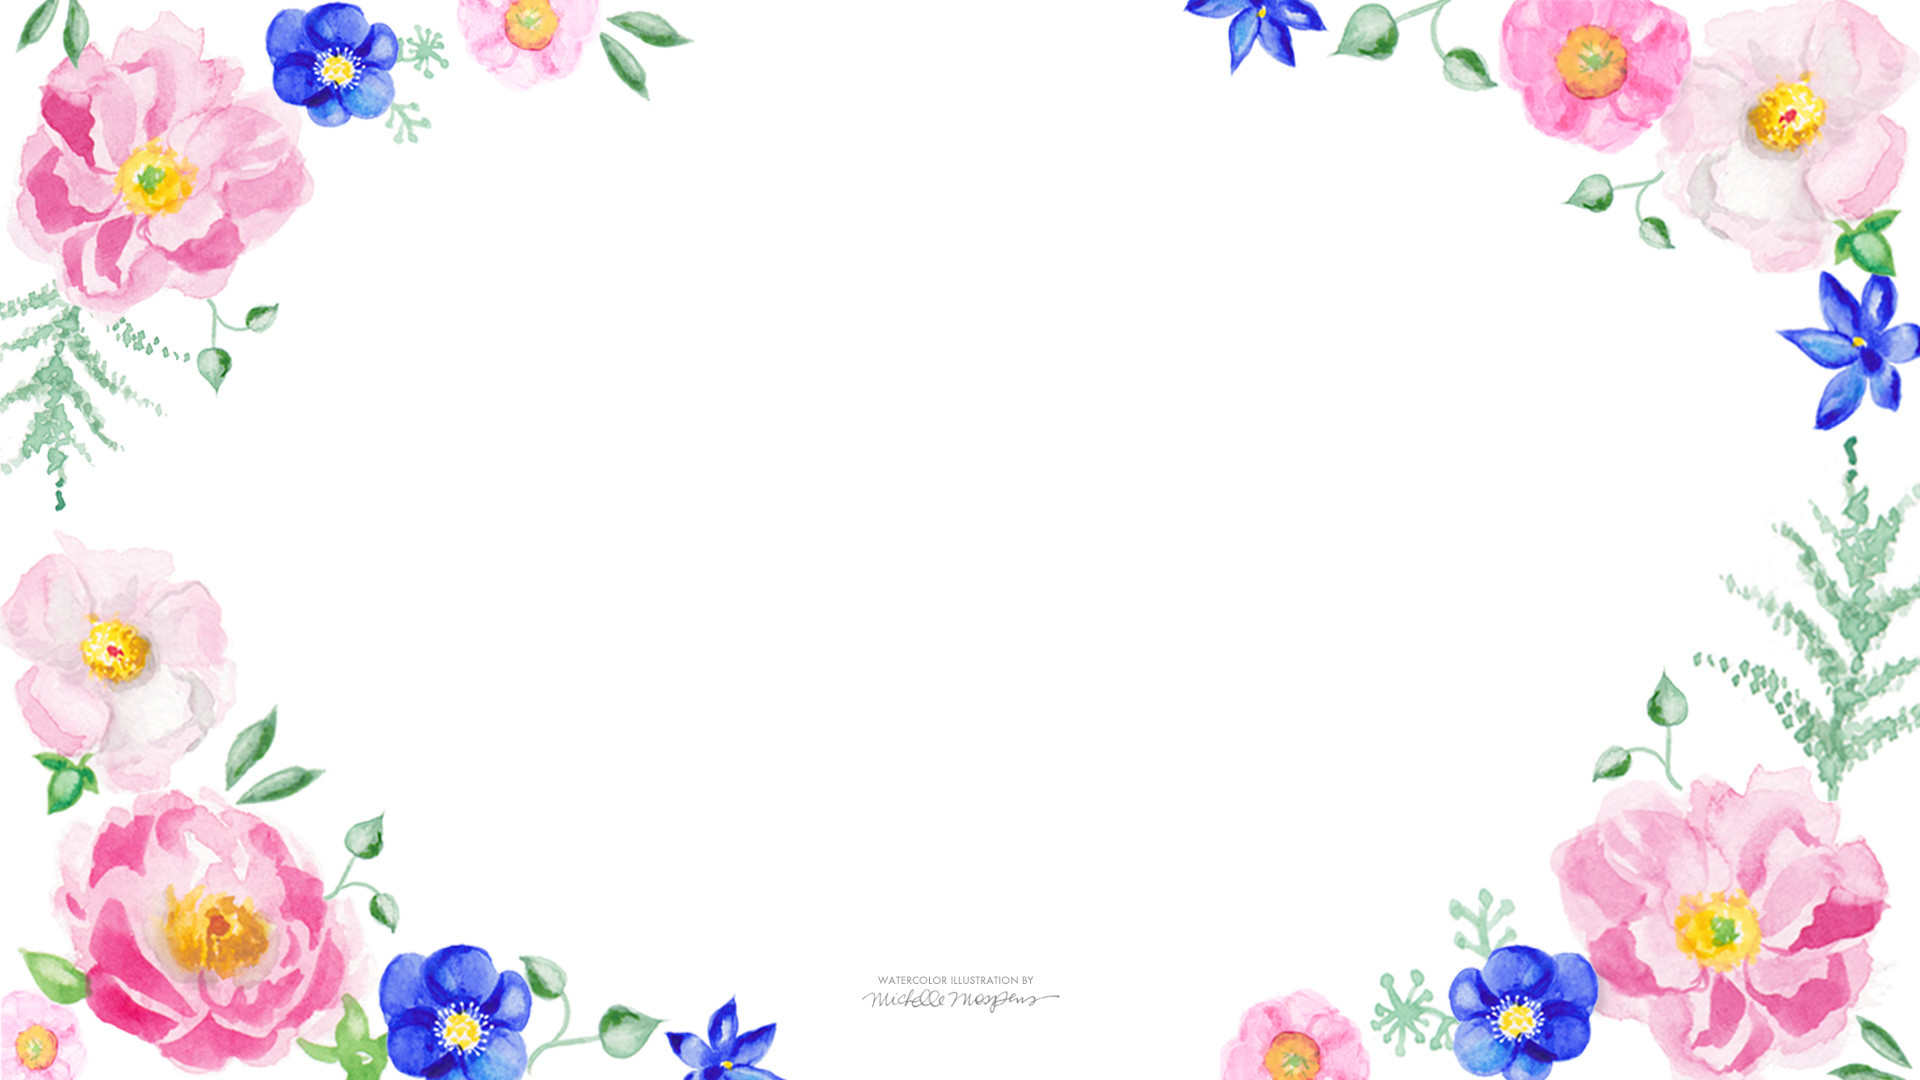 blue-pink-watercolor-floral-wallpaper-1920-1080.jpg (1920×1080) | Floral |  Pinterest | Wallpaper, Wallpaper desktop and Prints